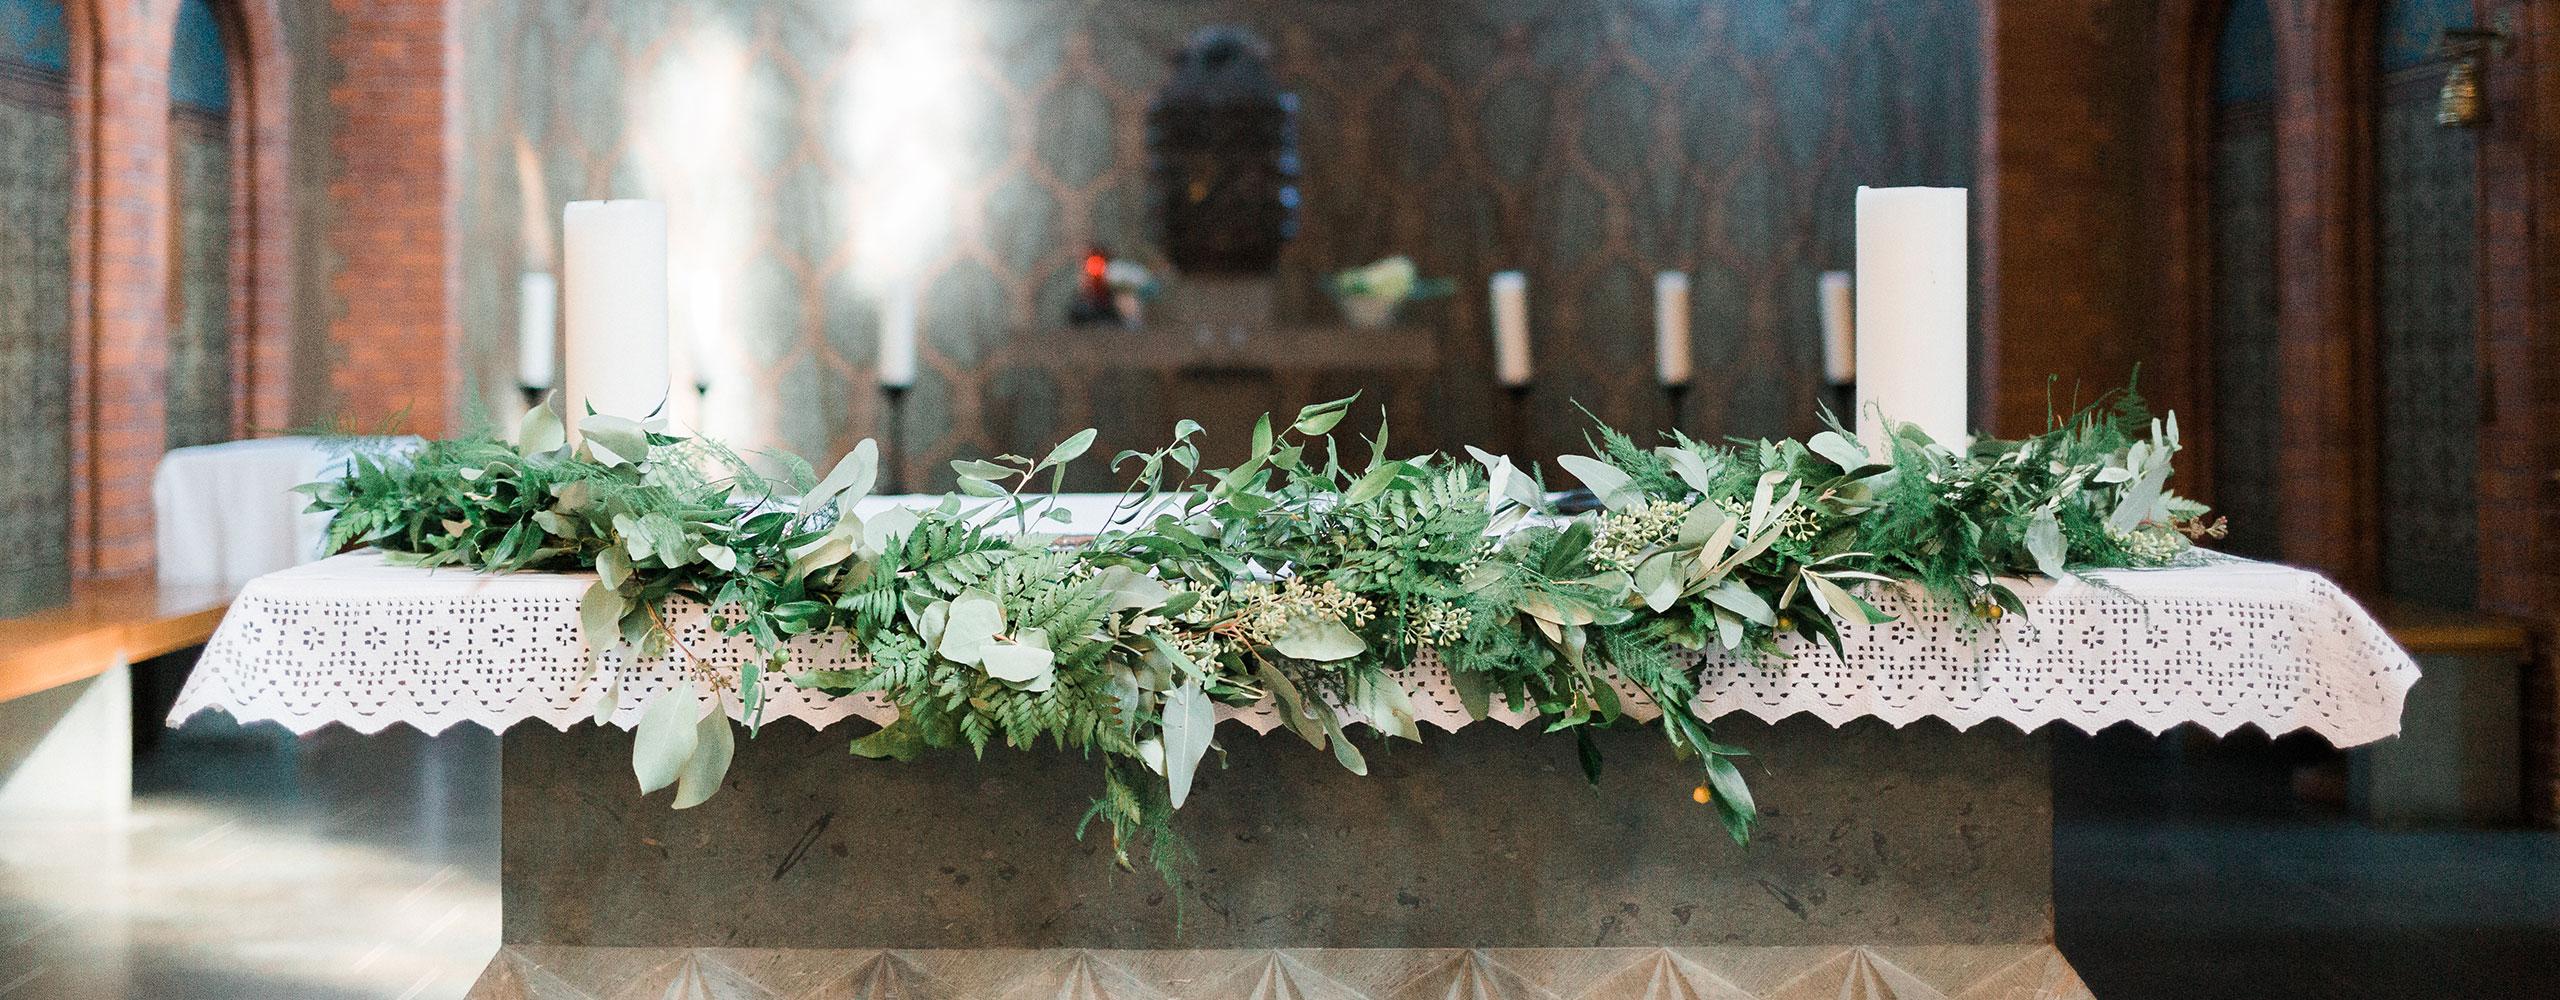 Altargirlande Greenery-Style - Kerstin Adrian